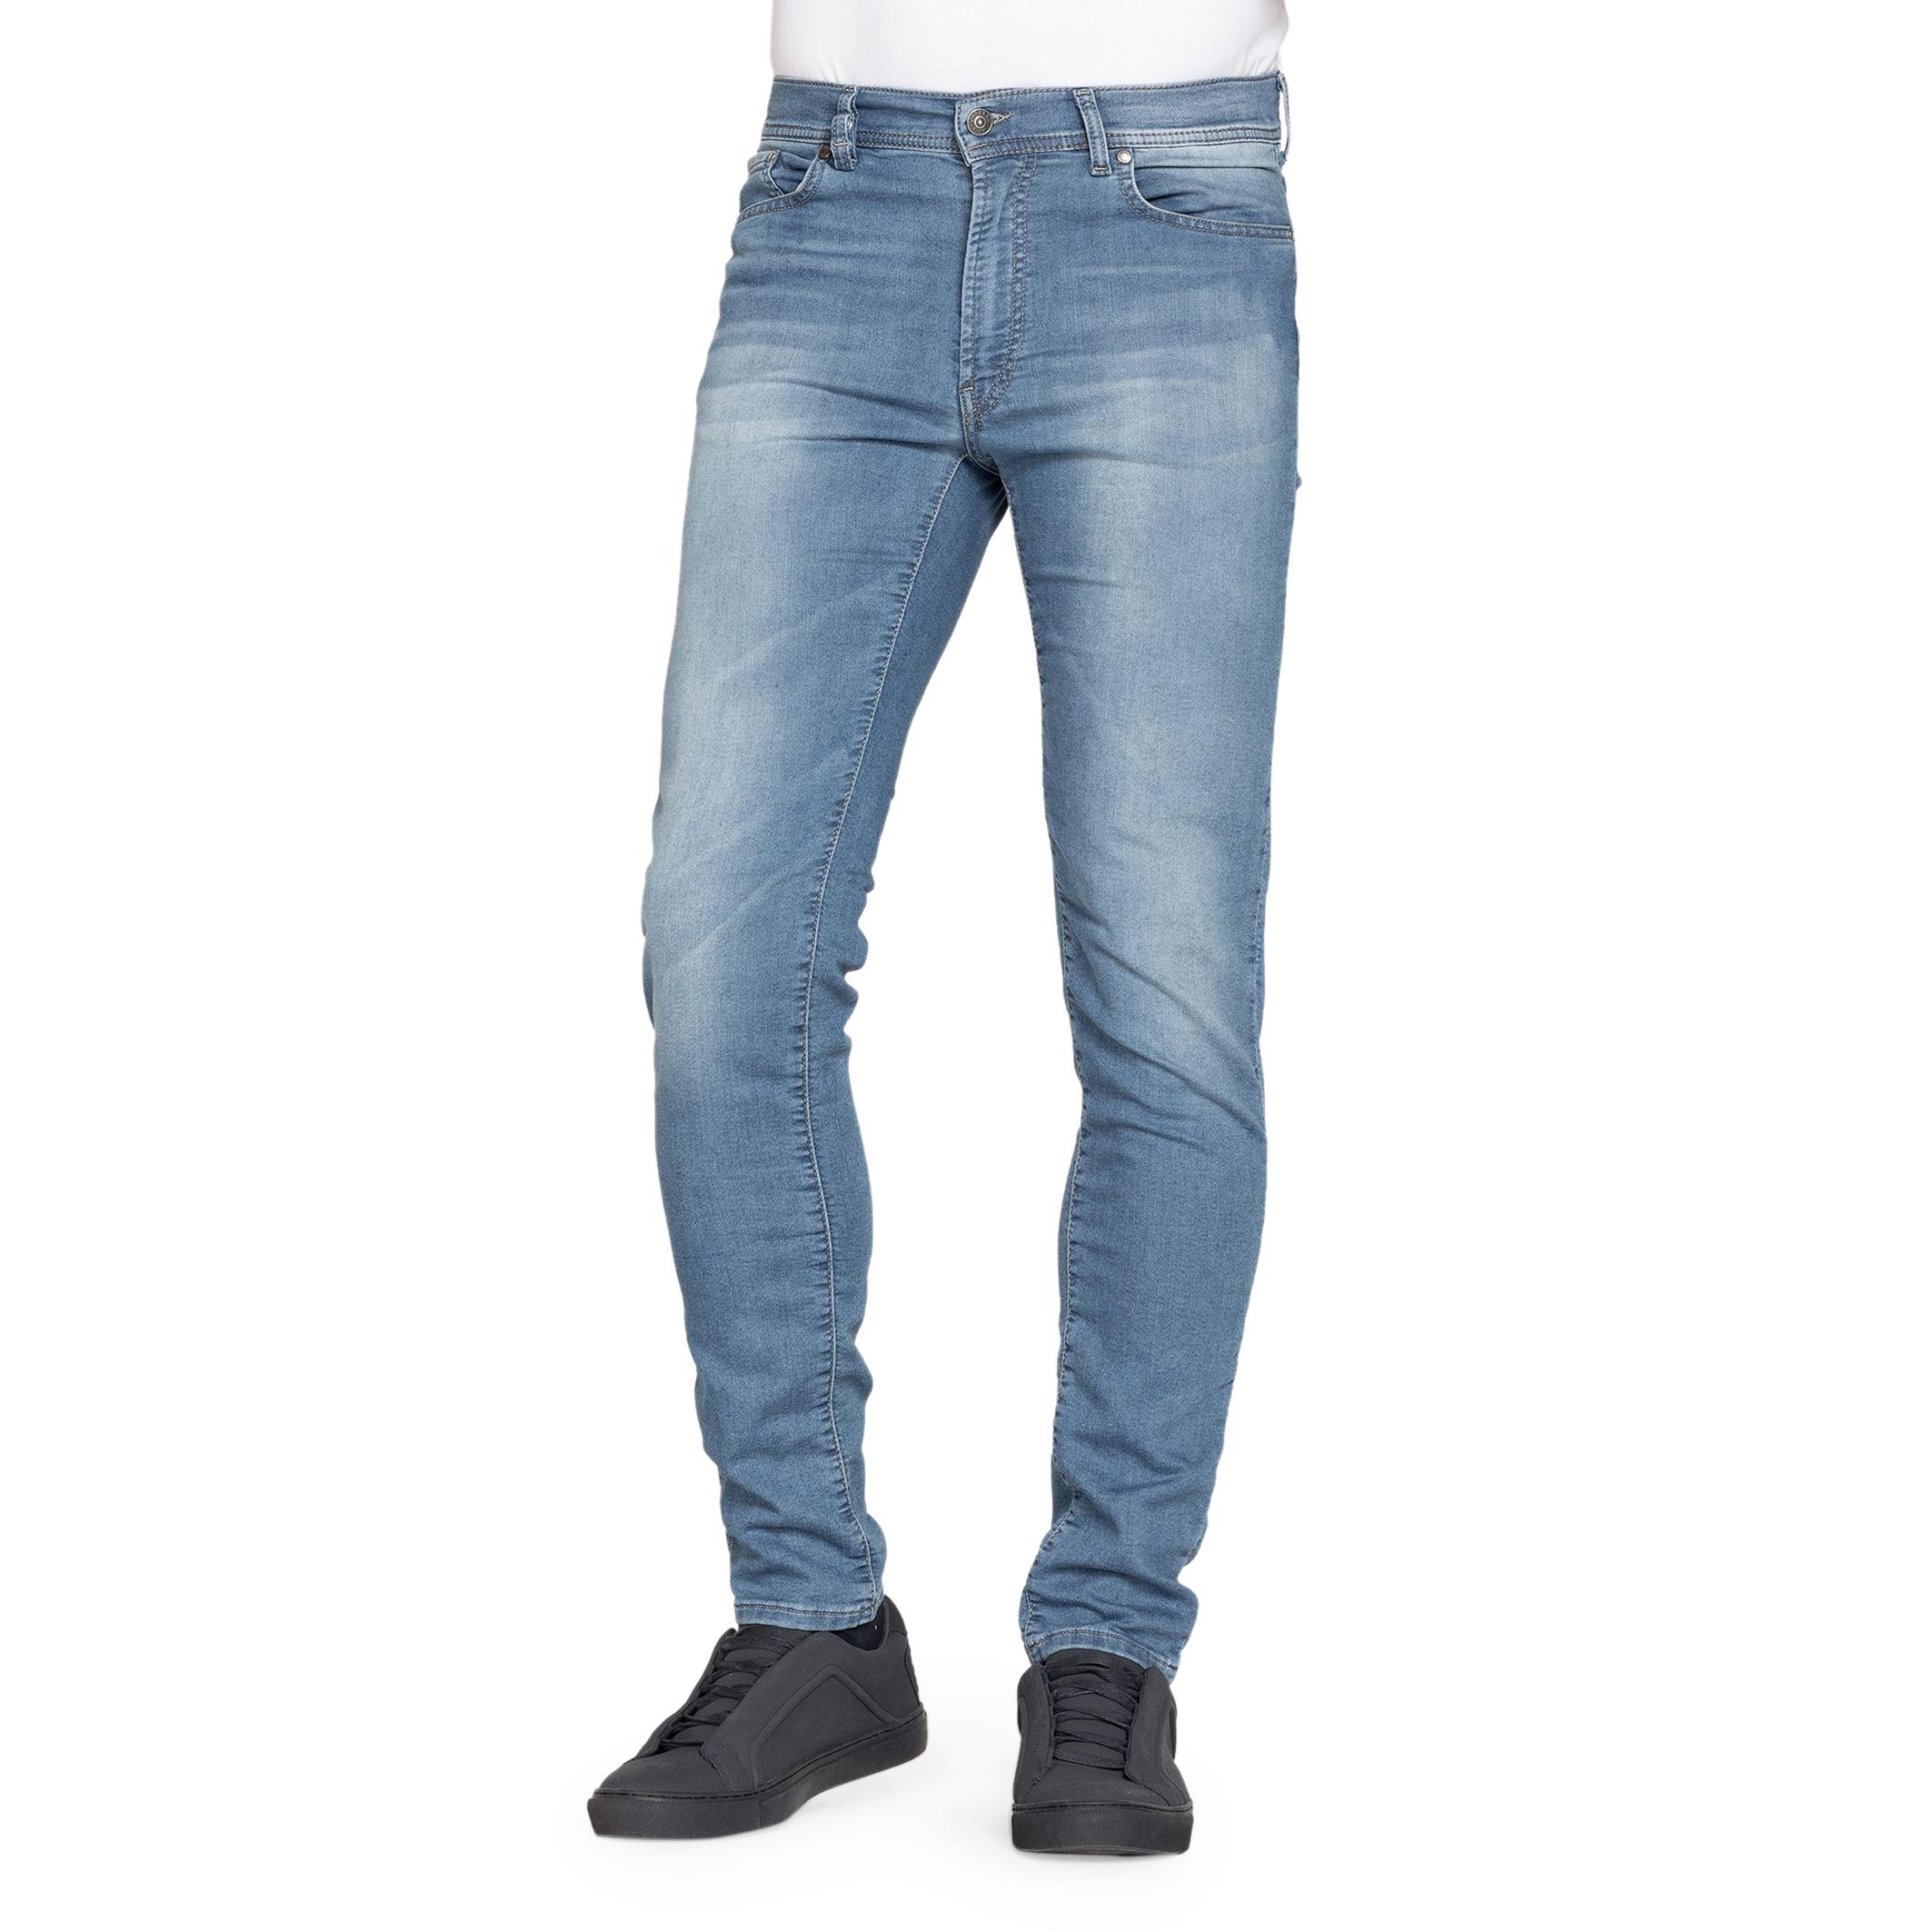 Carrera Jeans 0T707M 0900A PASSPORT